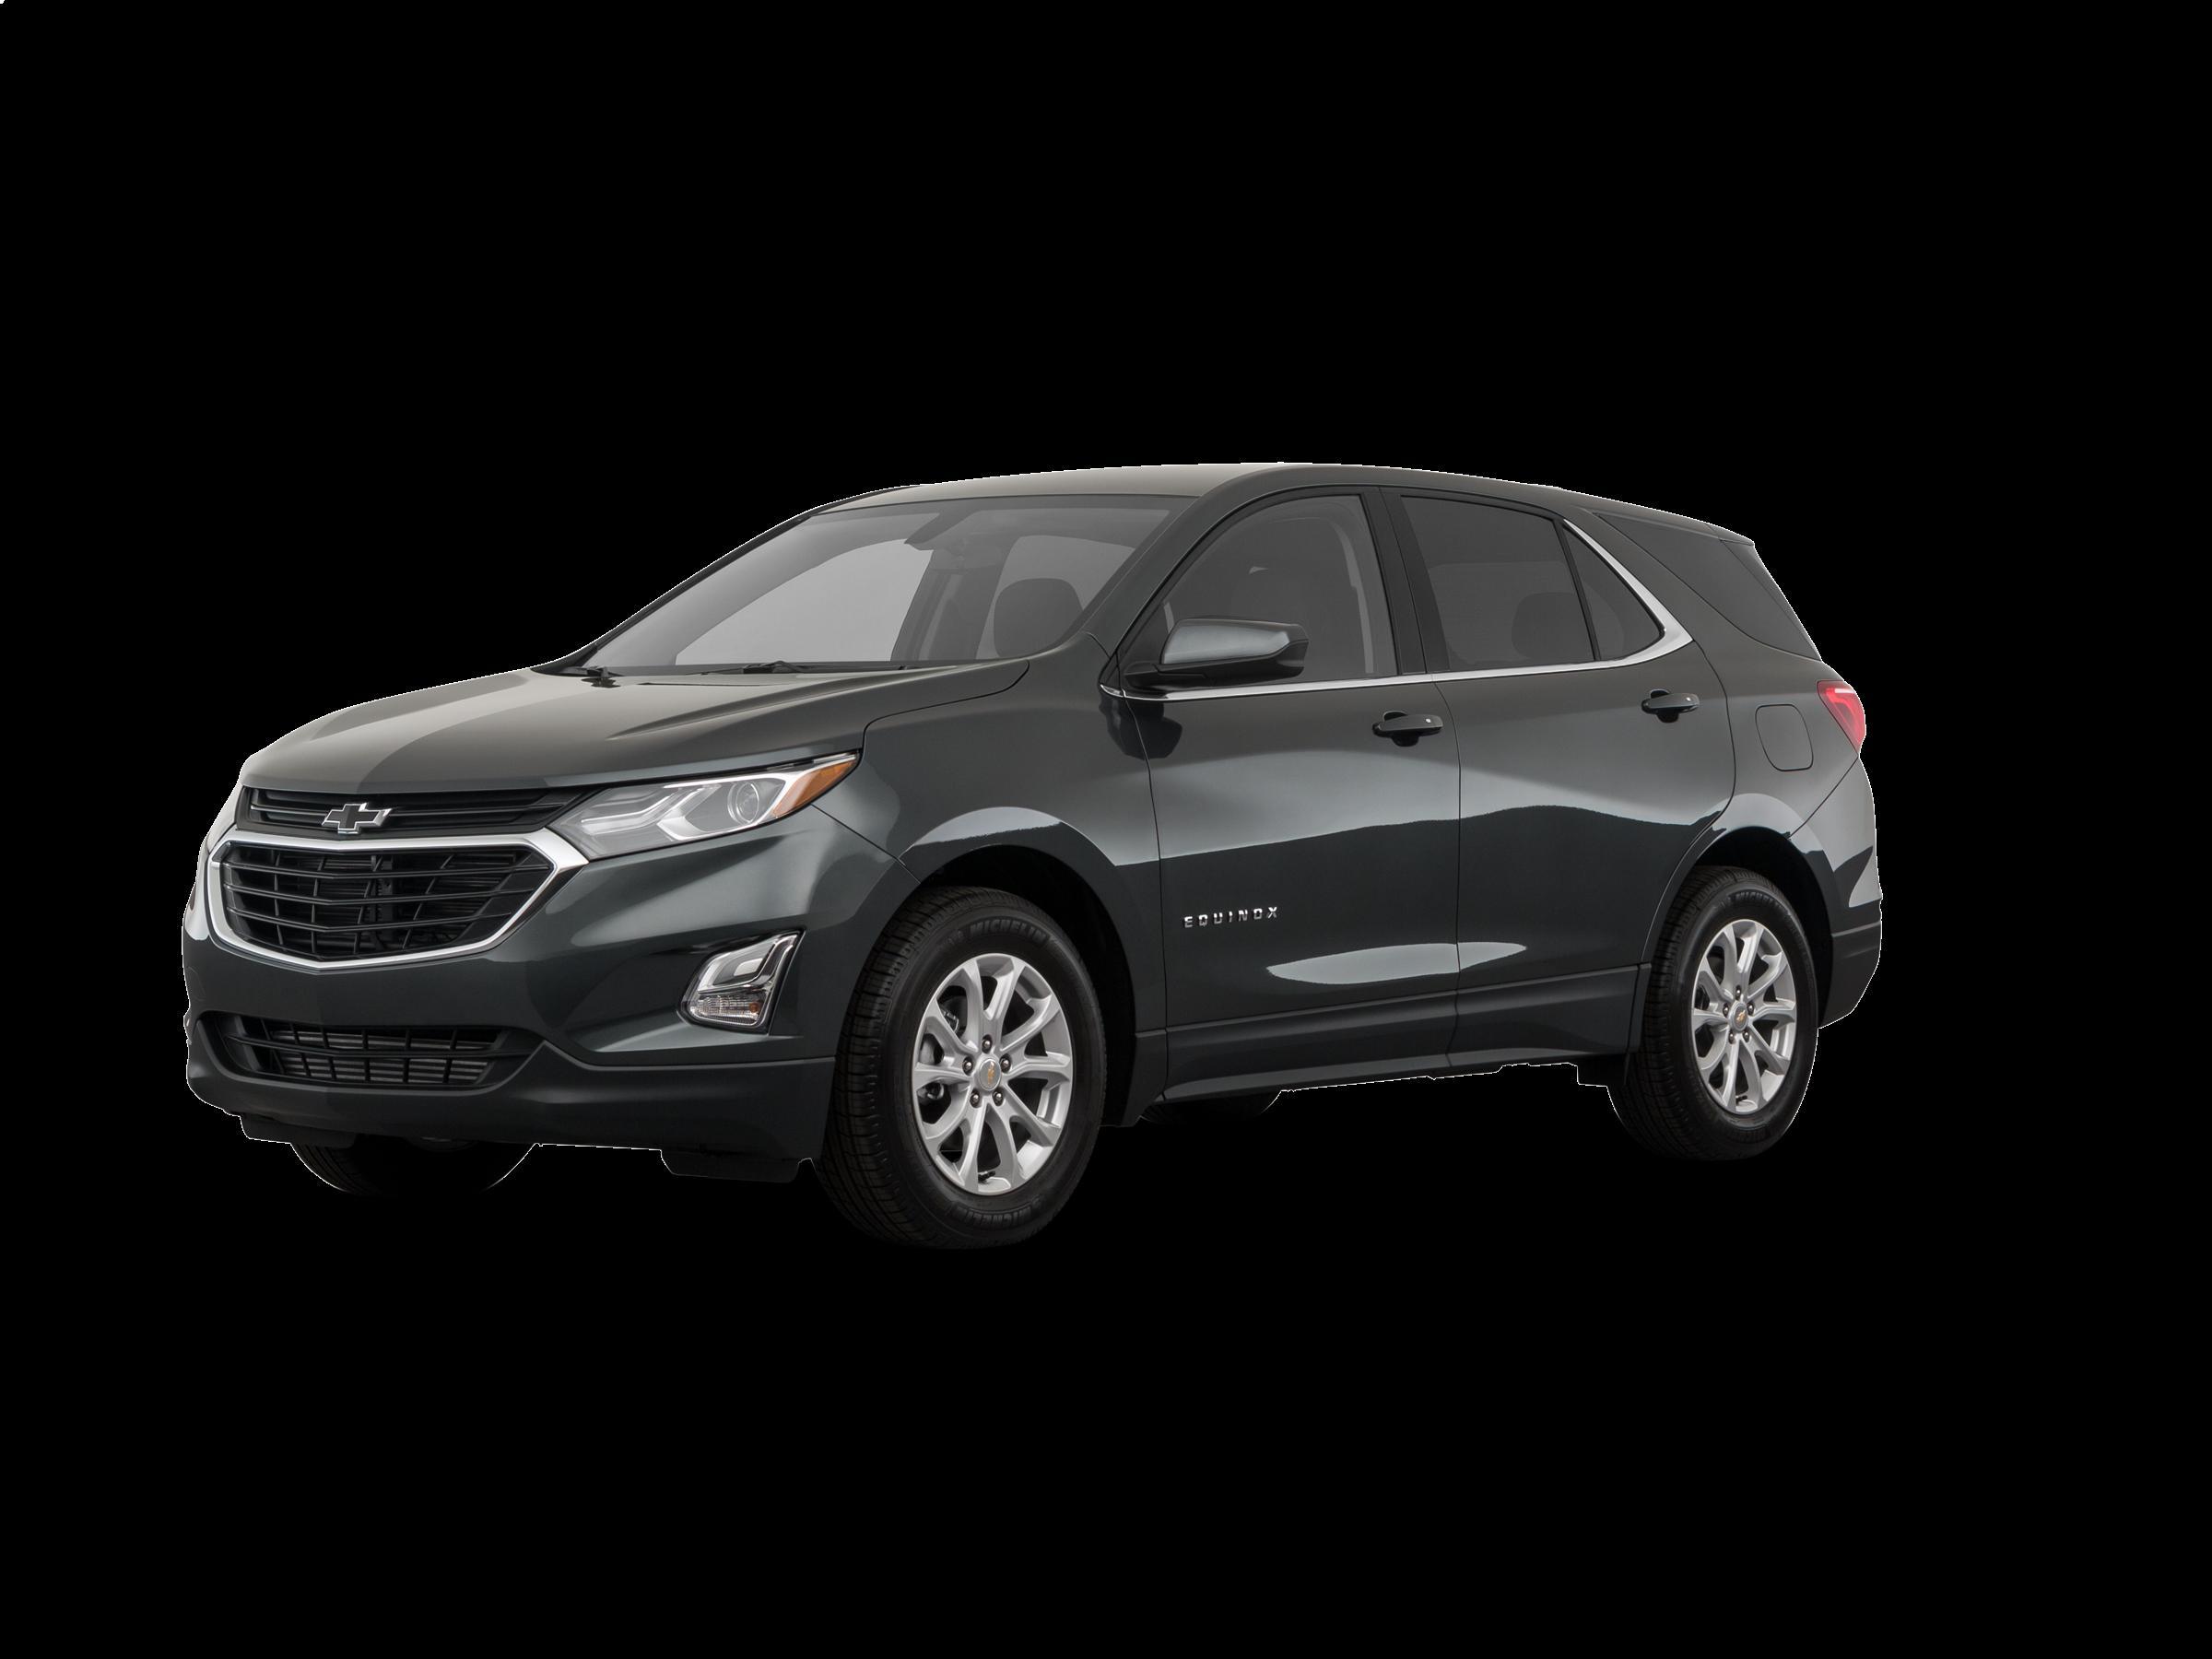 New 2020 Chevrolet Equinox Lt Prices Kelley Blue Book